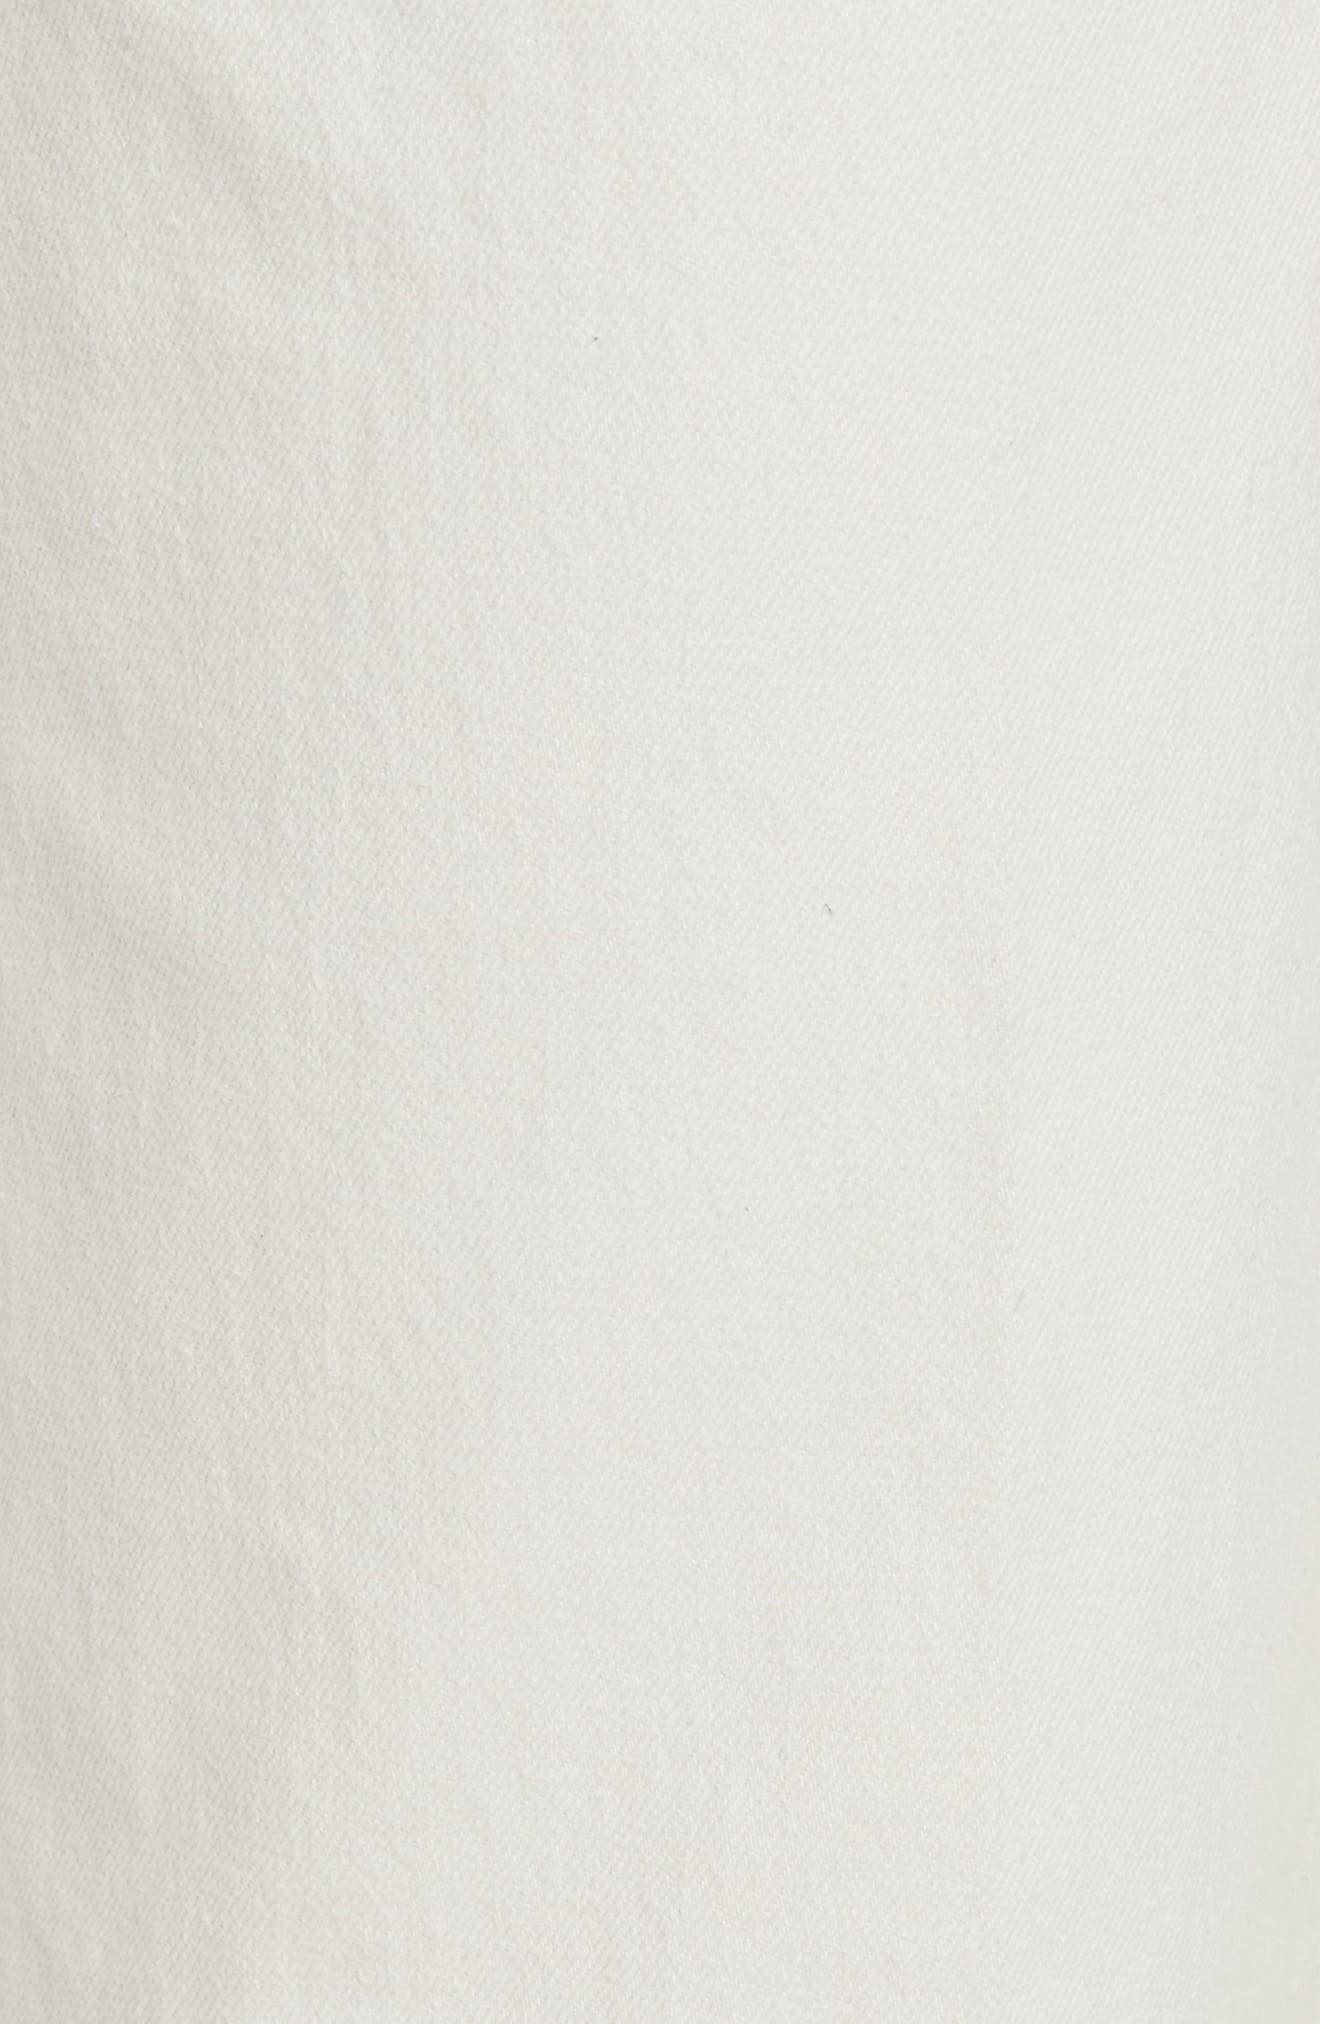 Rachey Comey Legion Crop Wide Leg Pants,                             Alternate thumbnail 5, color,                             DIRTY WHITE